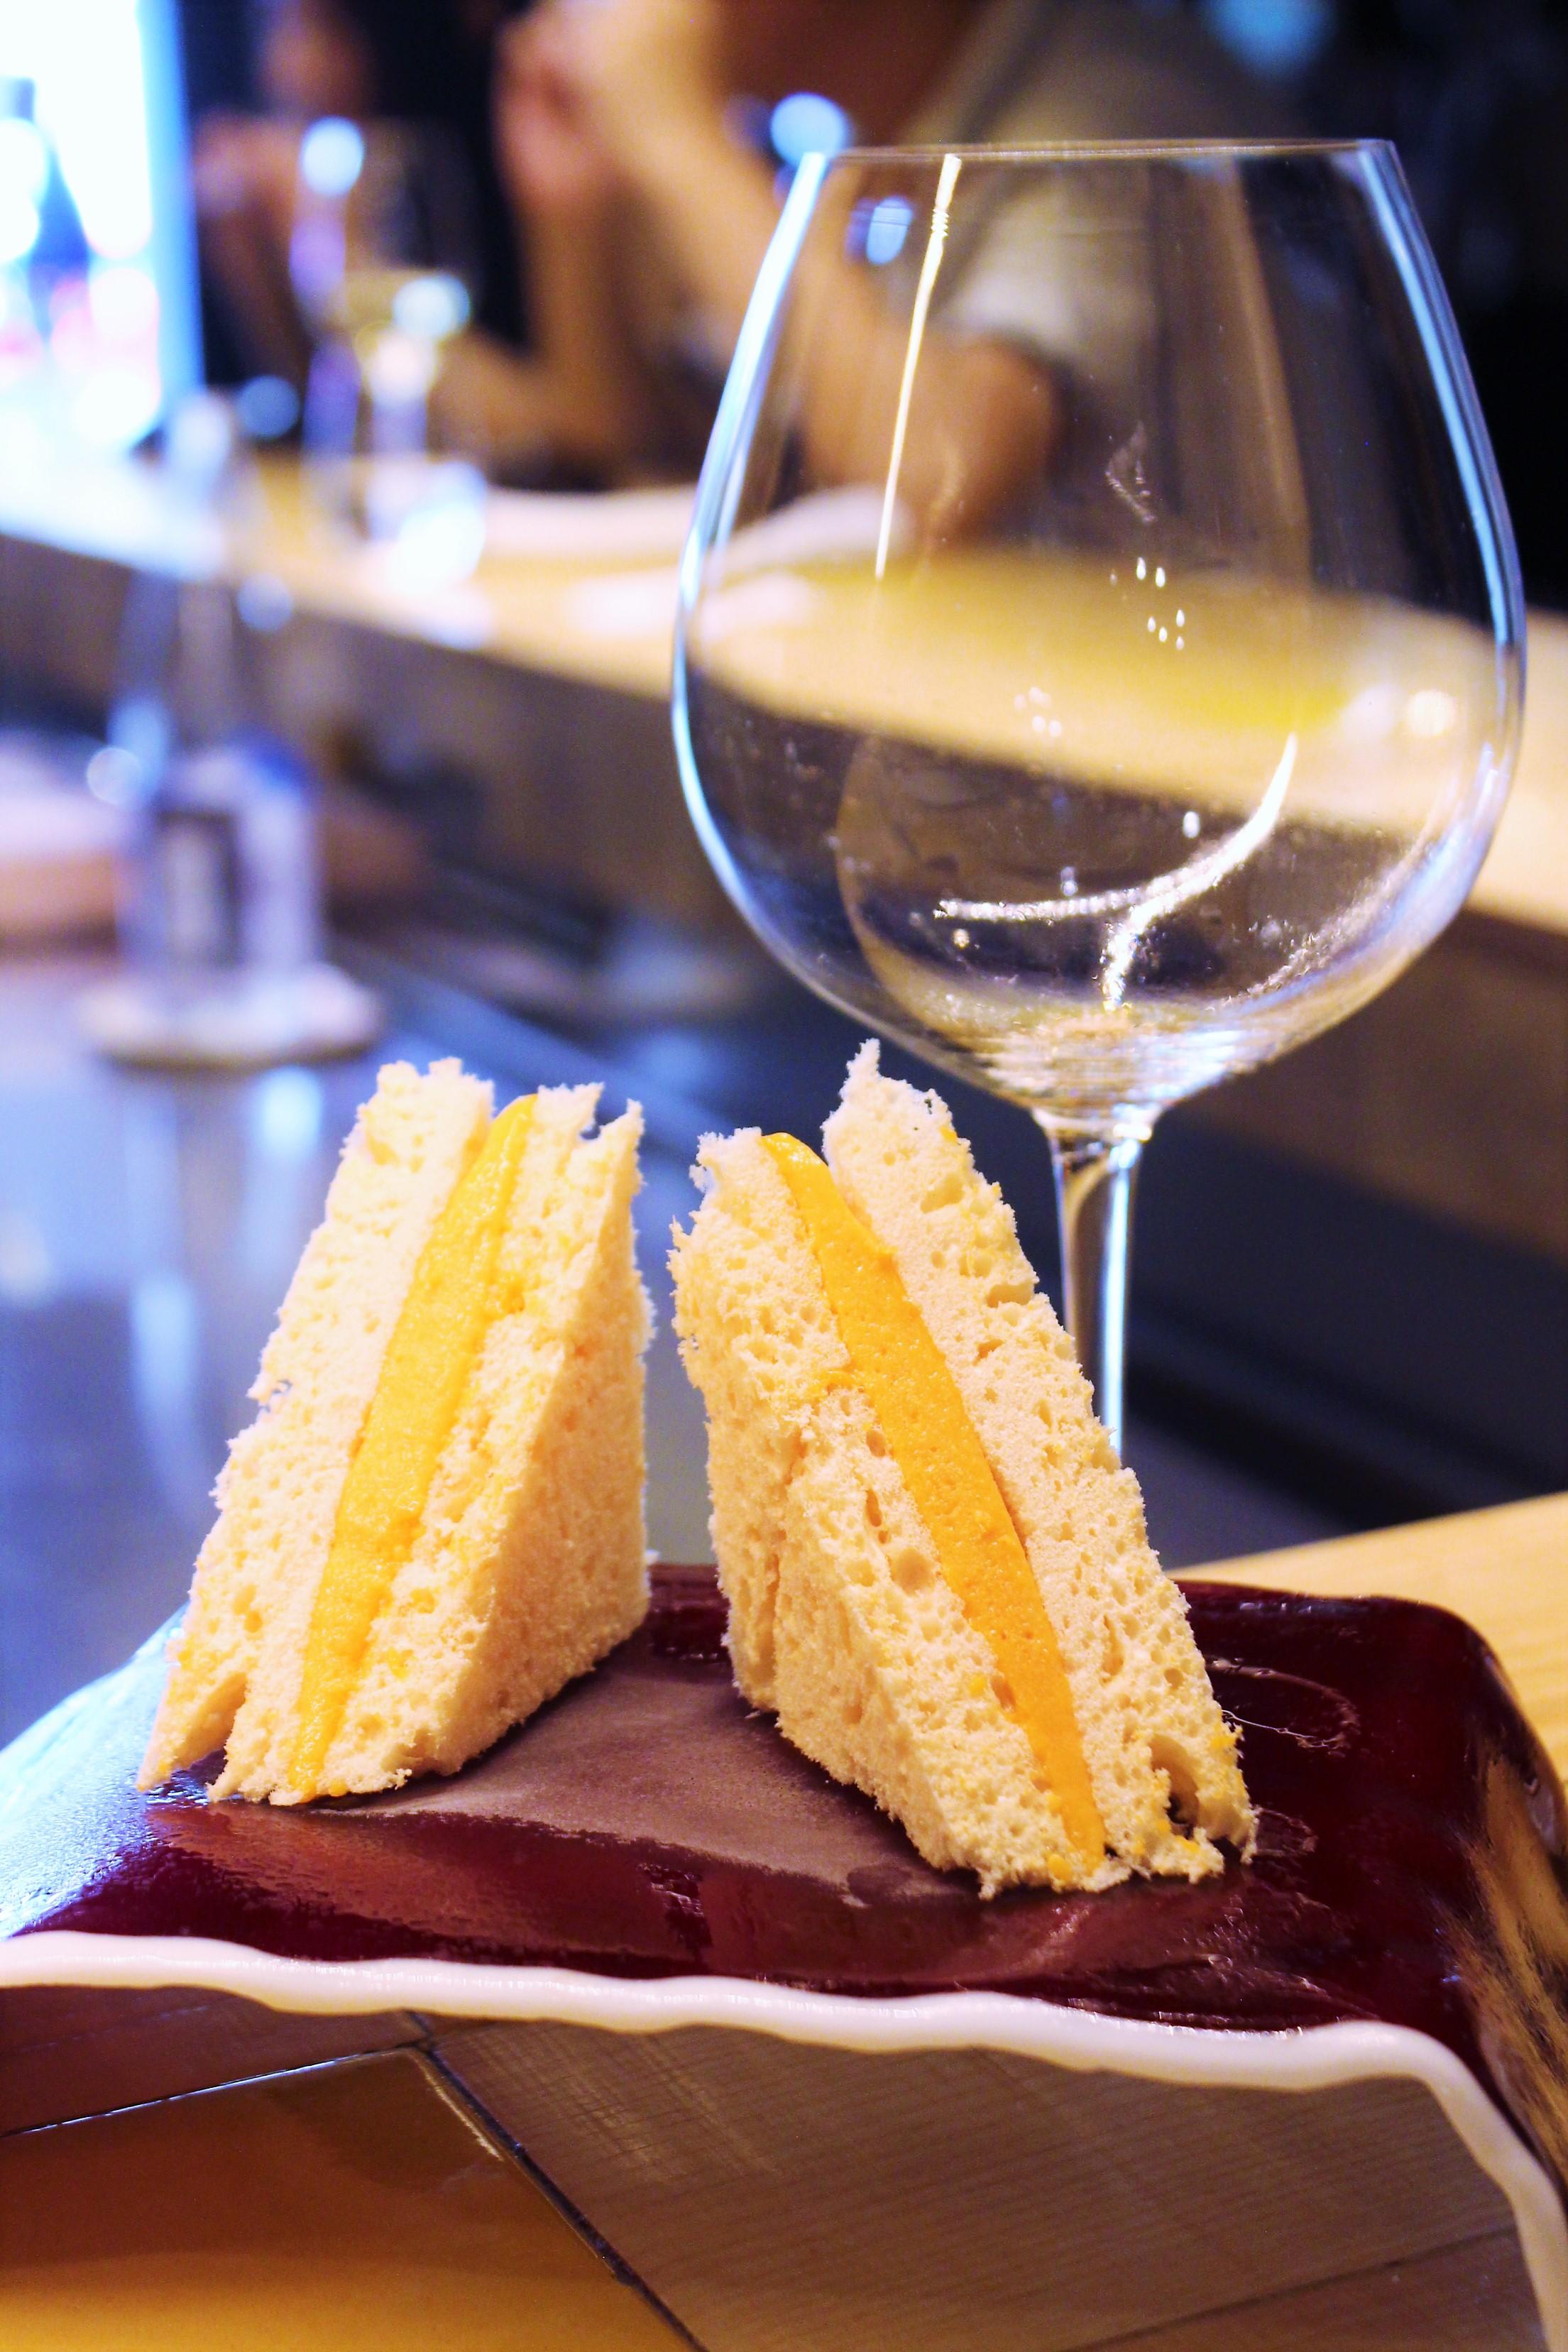 Gazpacho Sandwich with Vinegar Garnish at Disfrutar in Barcelona